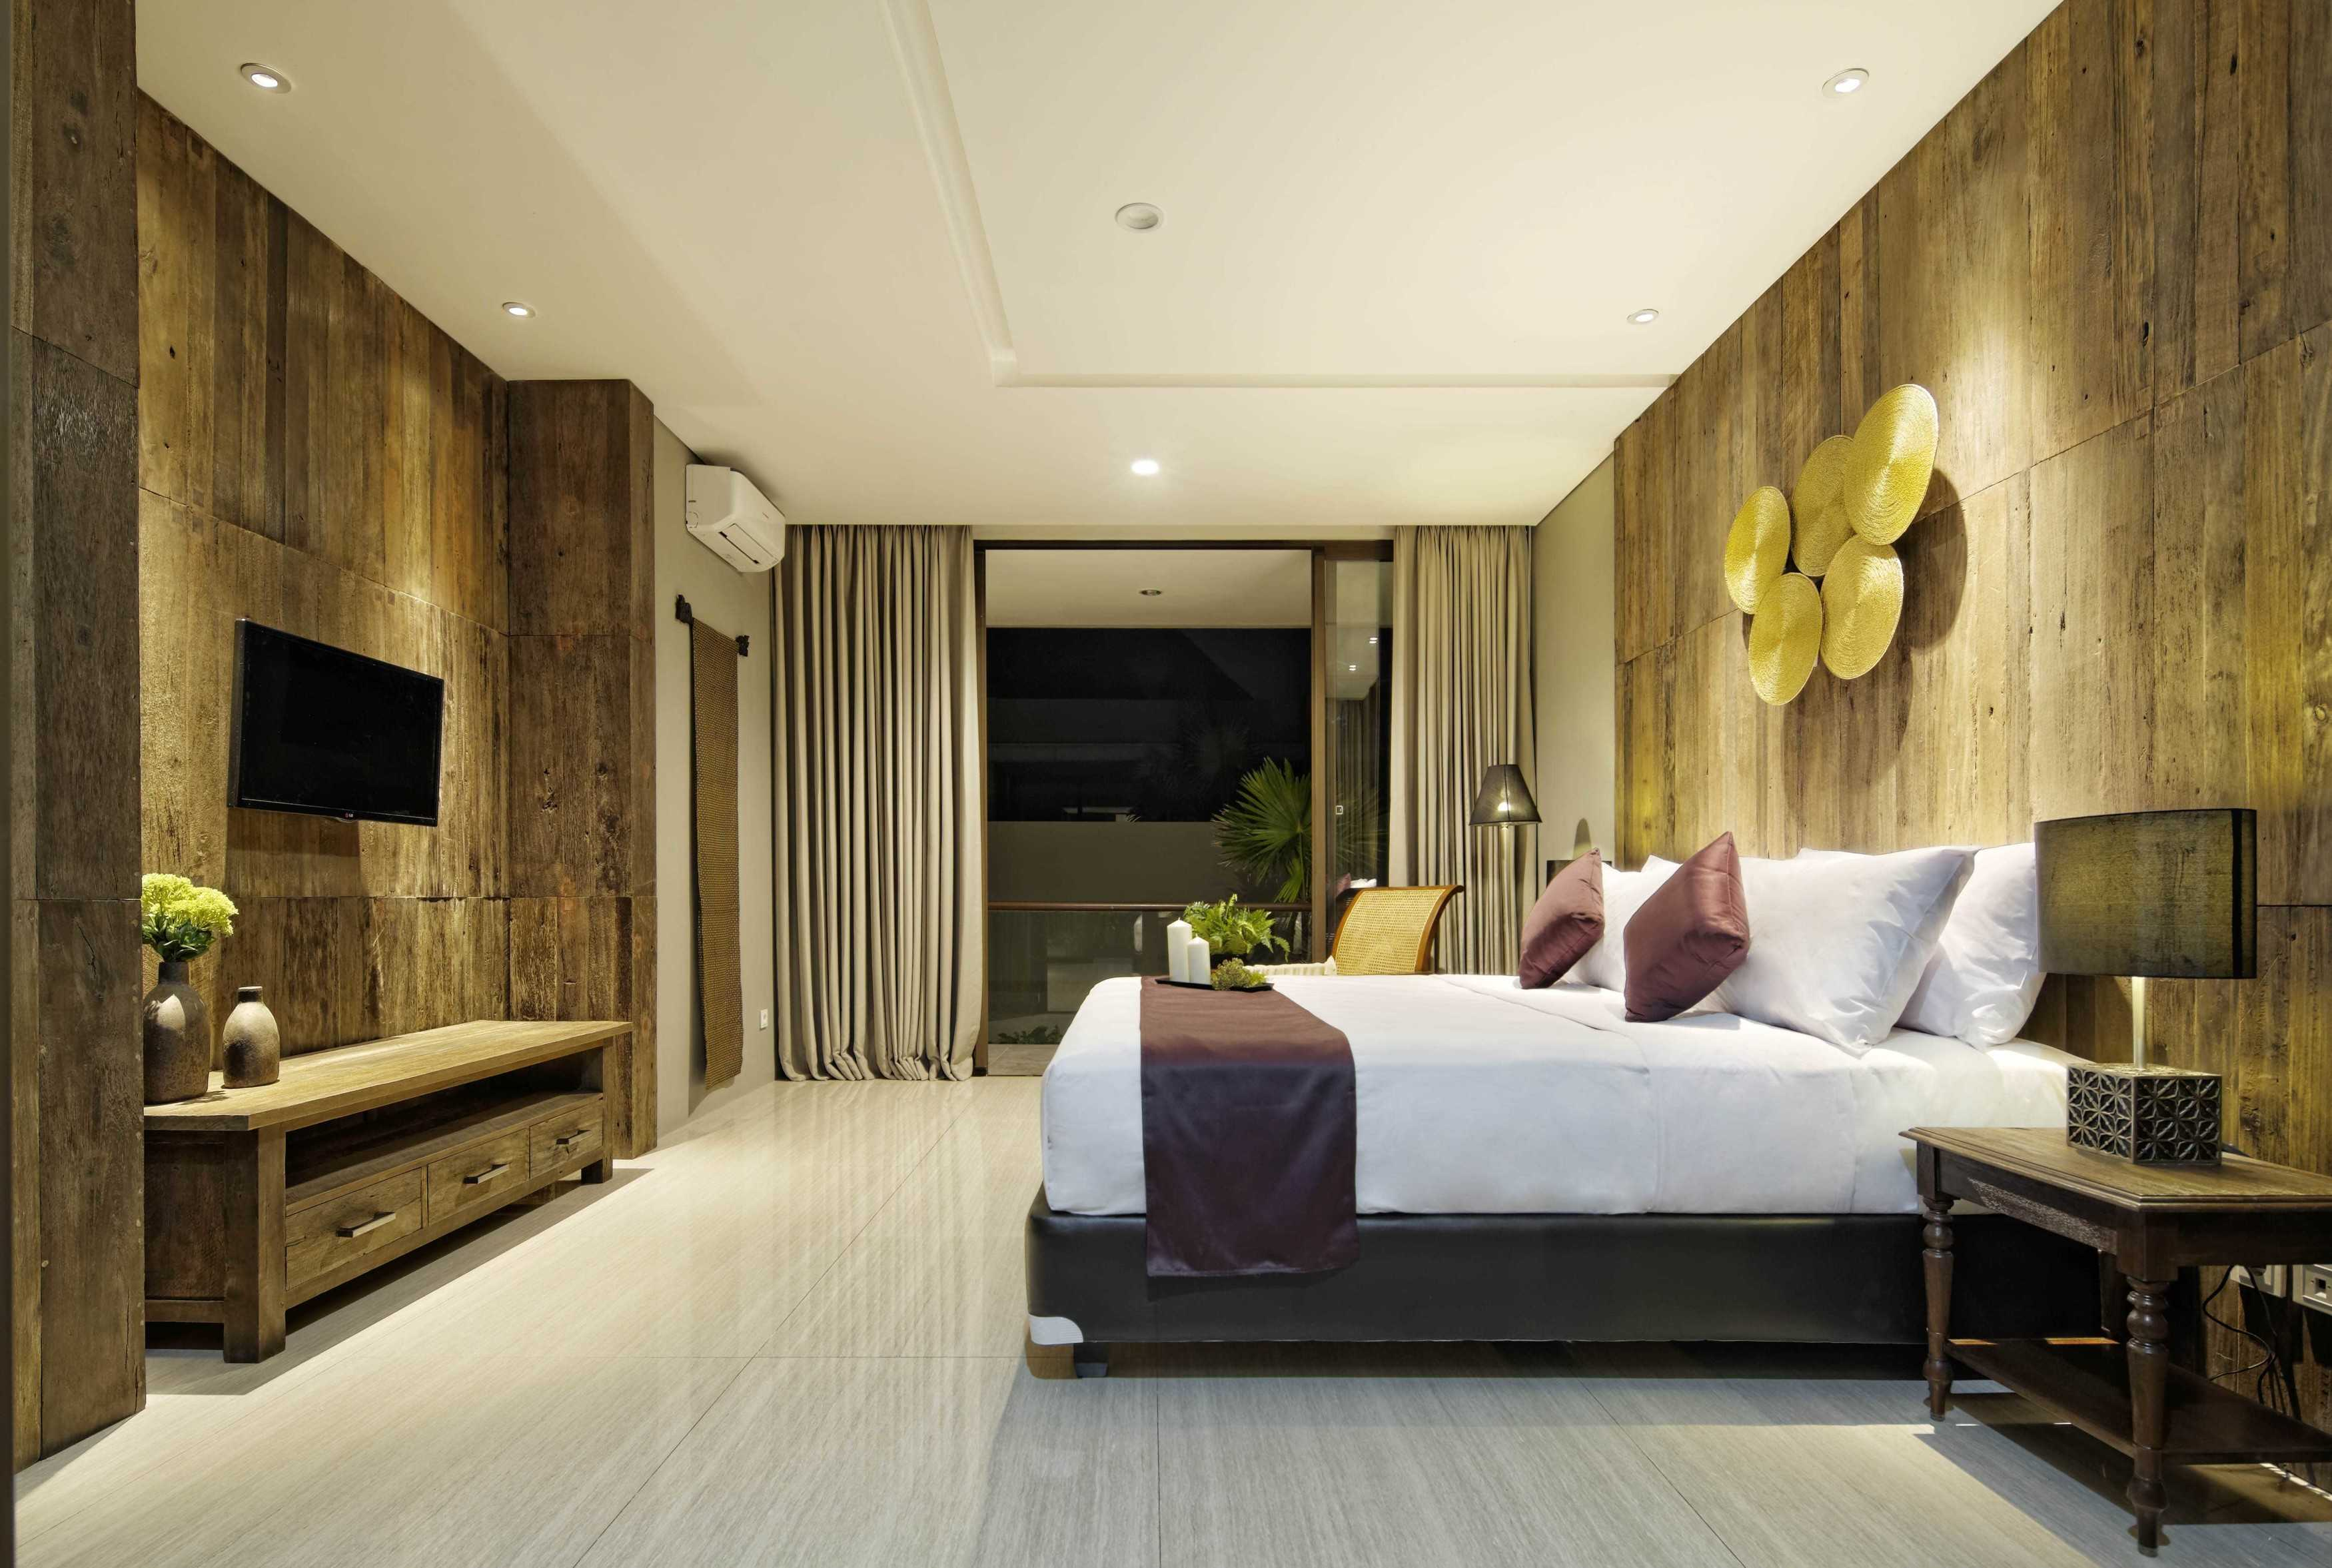 Pt. Modula Habitat At Hyarta Yogyakarta Yogyakarta Bedroom   26895